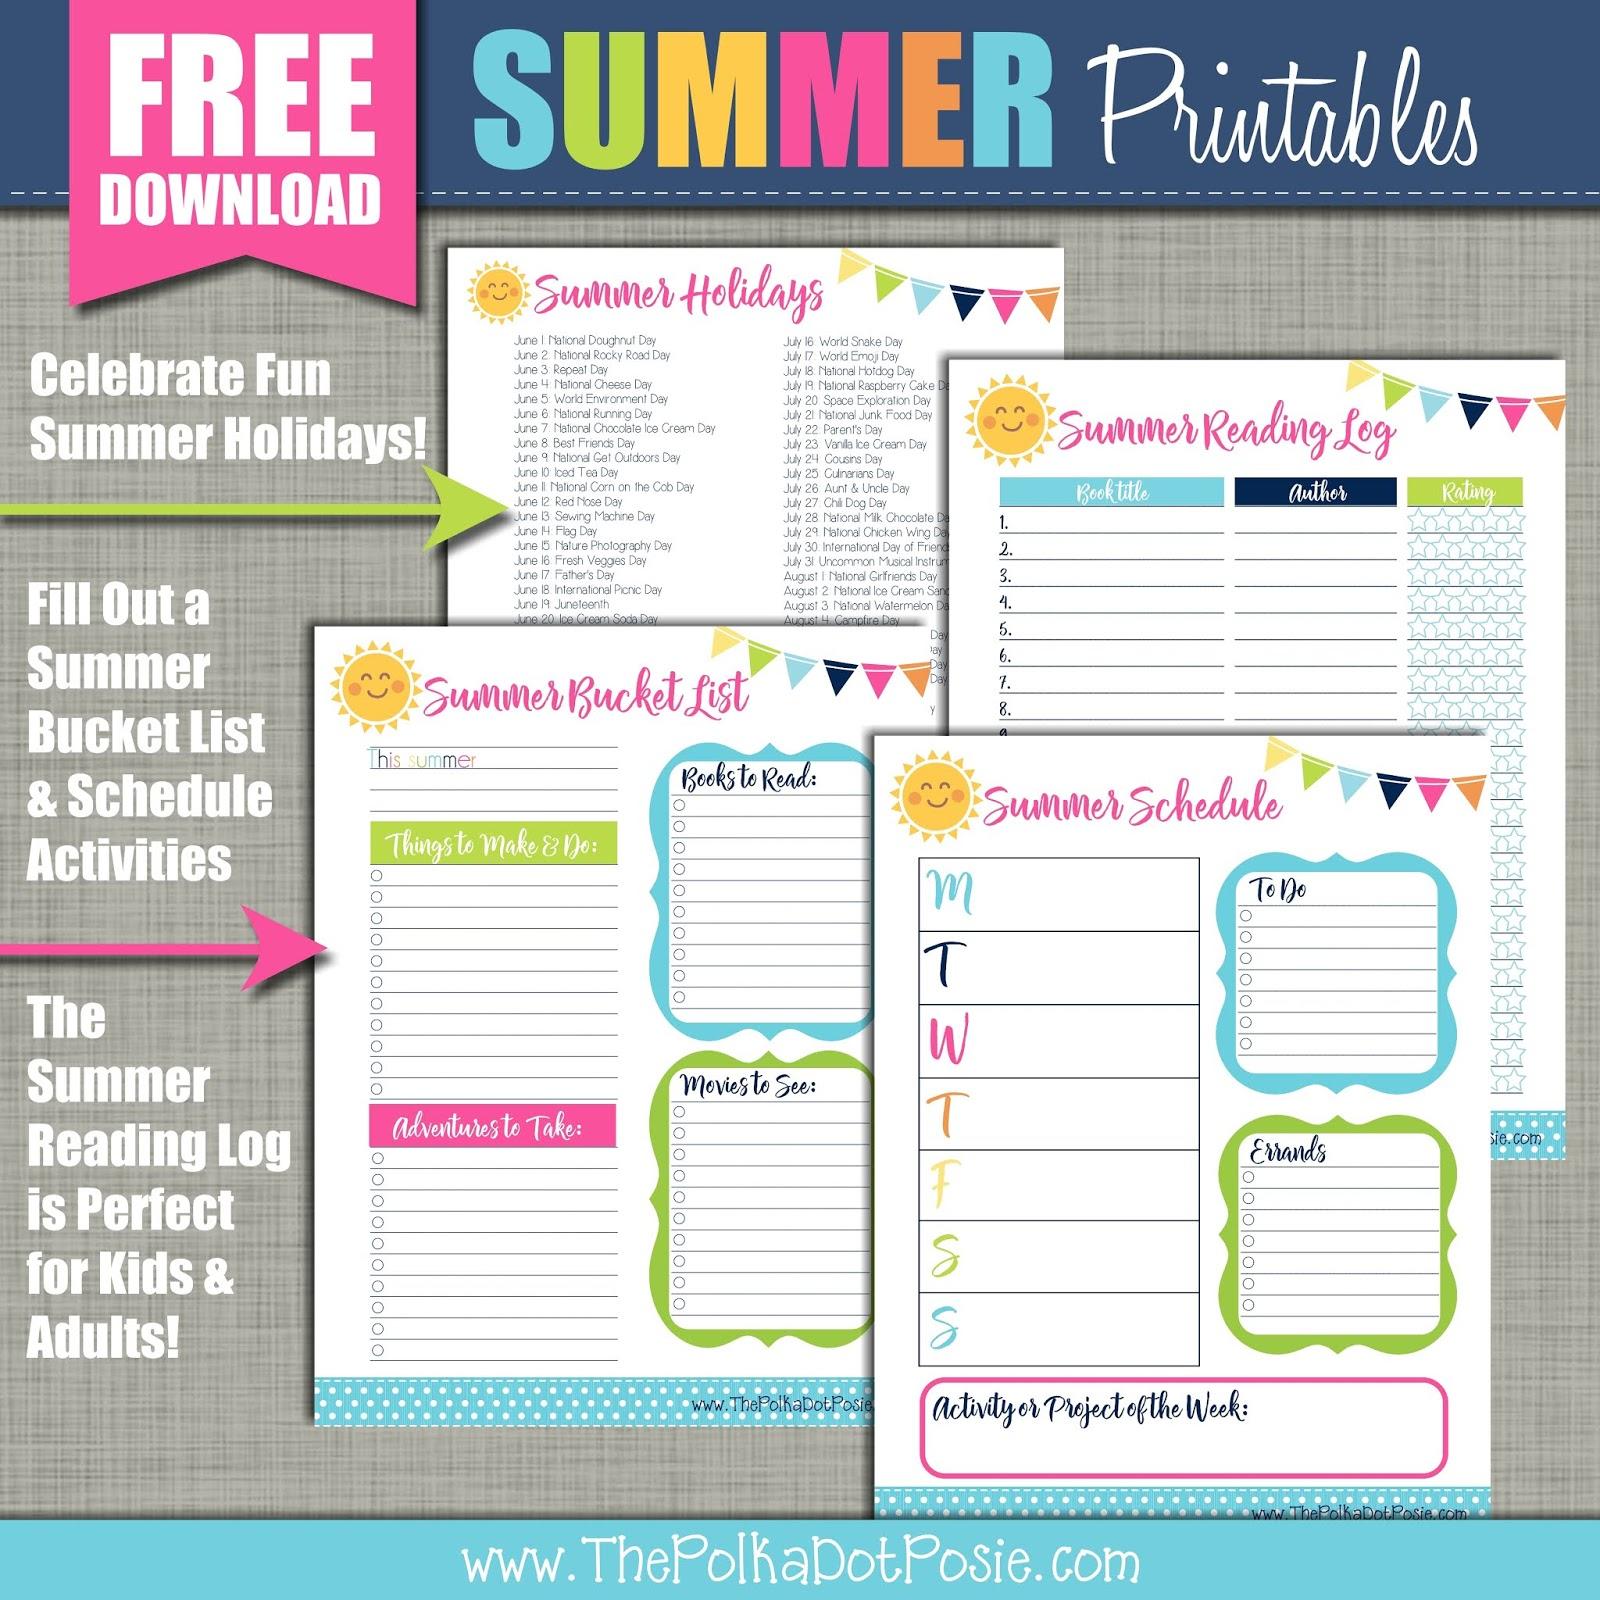 Summer Bucket List Printable Planner